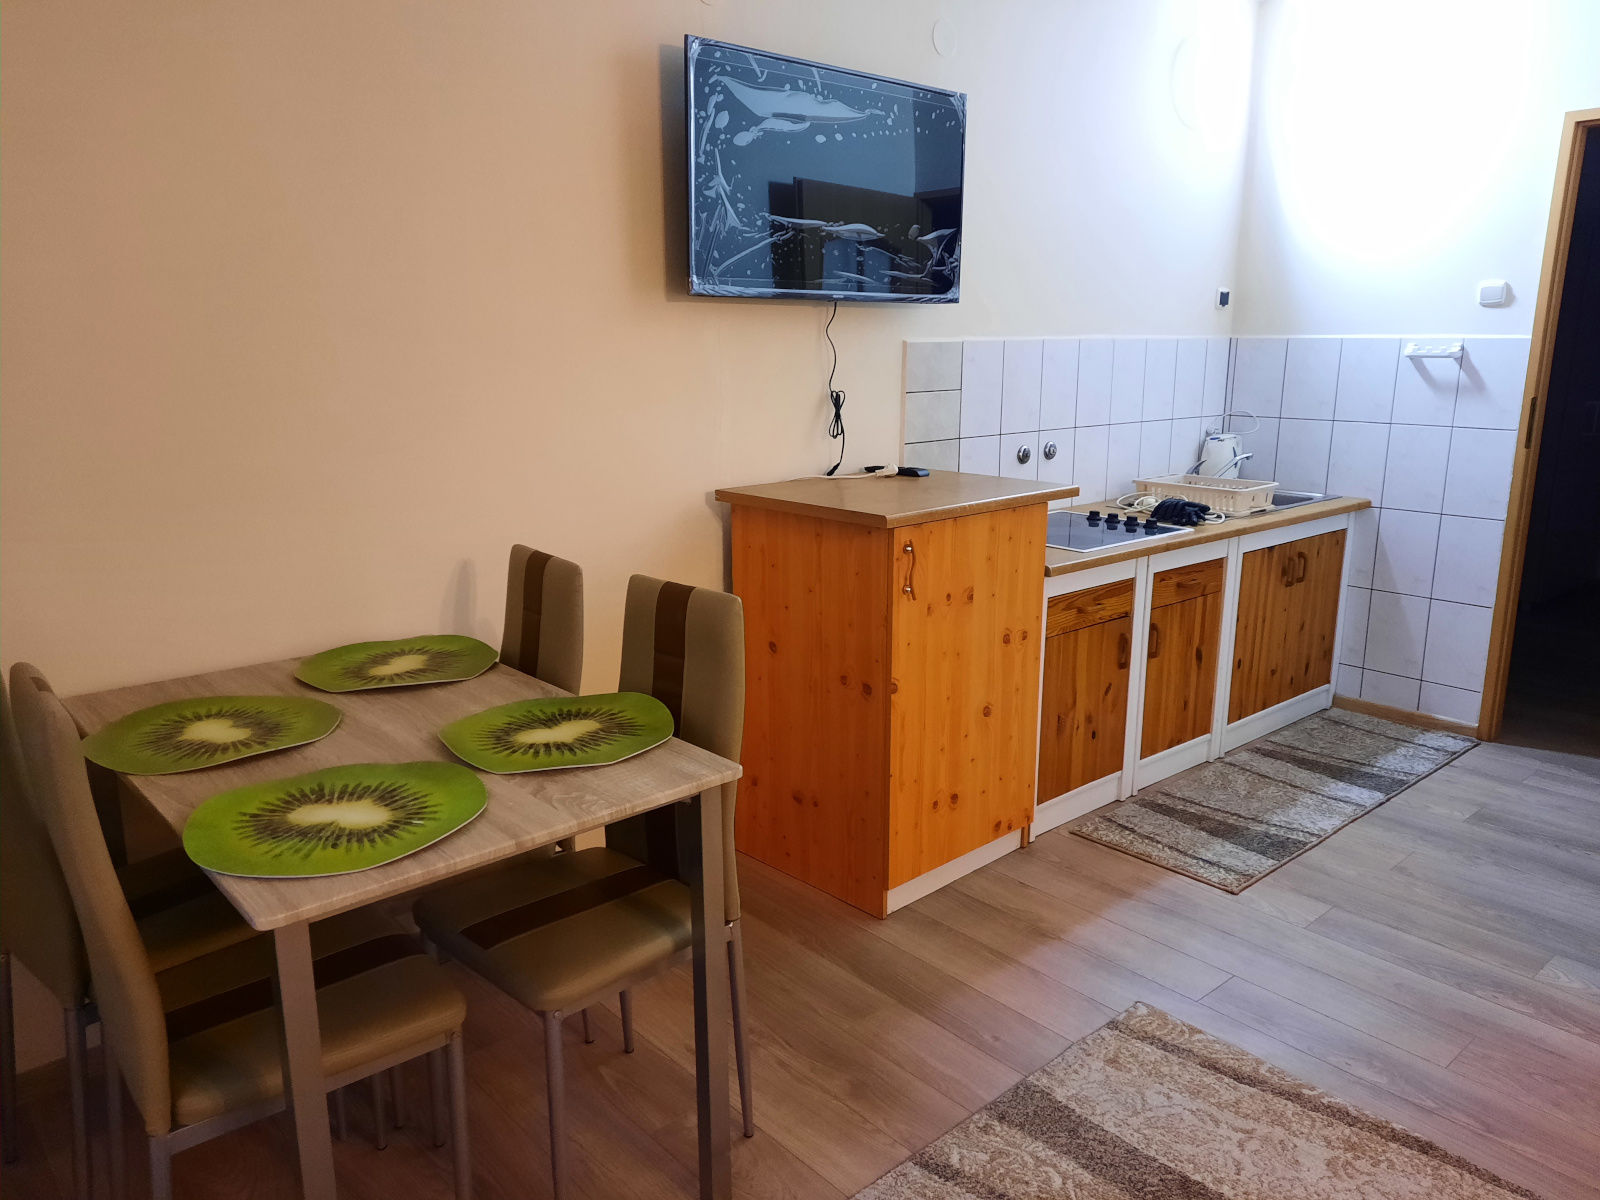 Studio 6 - aneks kuchenny